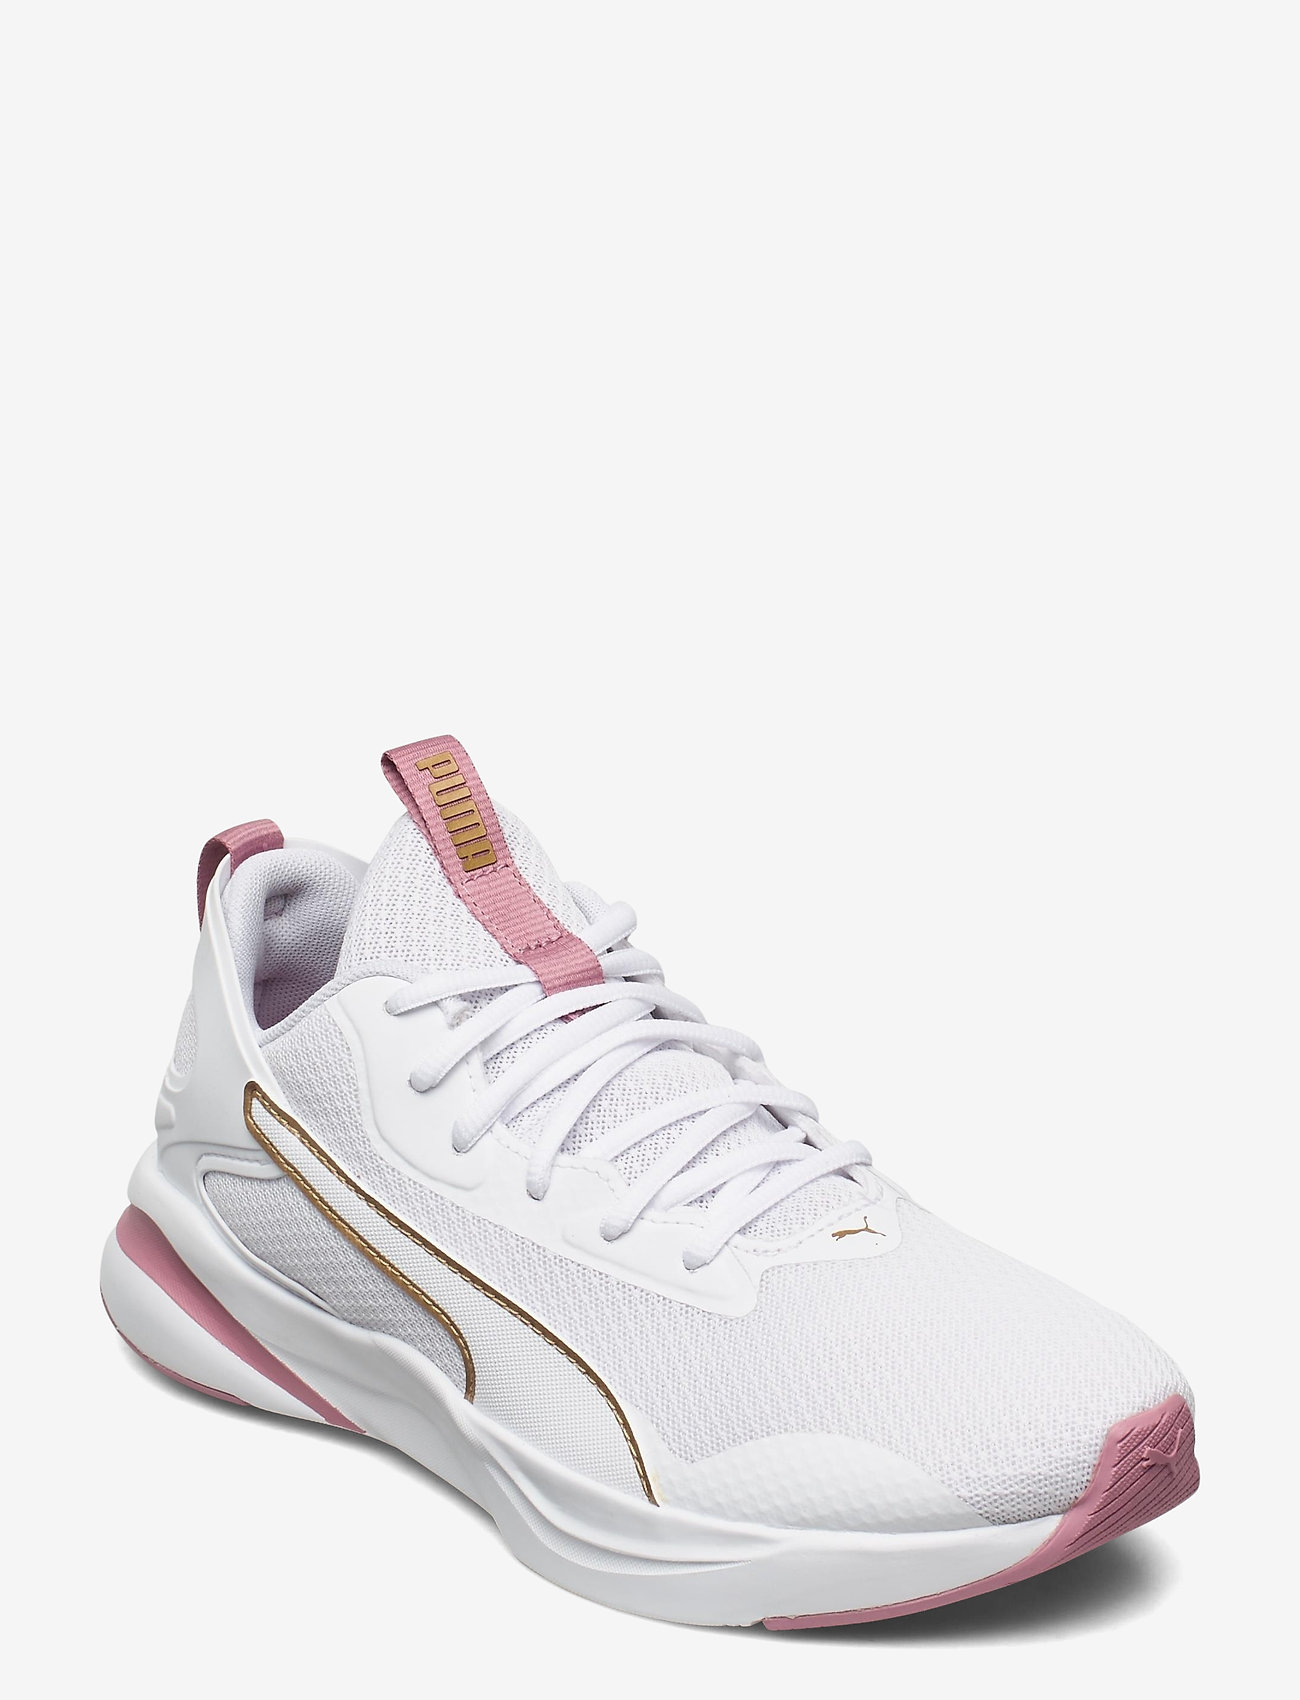 PUMA - SOFTRIDE RIFT Wn's - lage sneakers - puma white-foxglove - 0